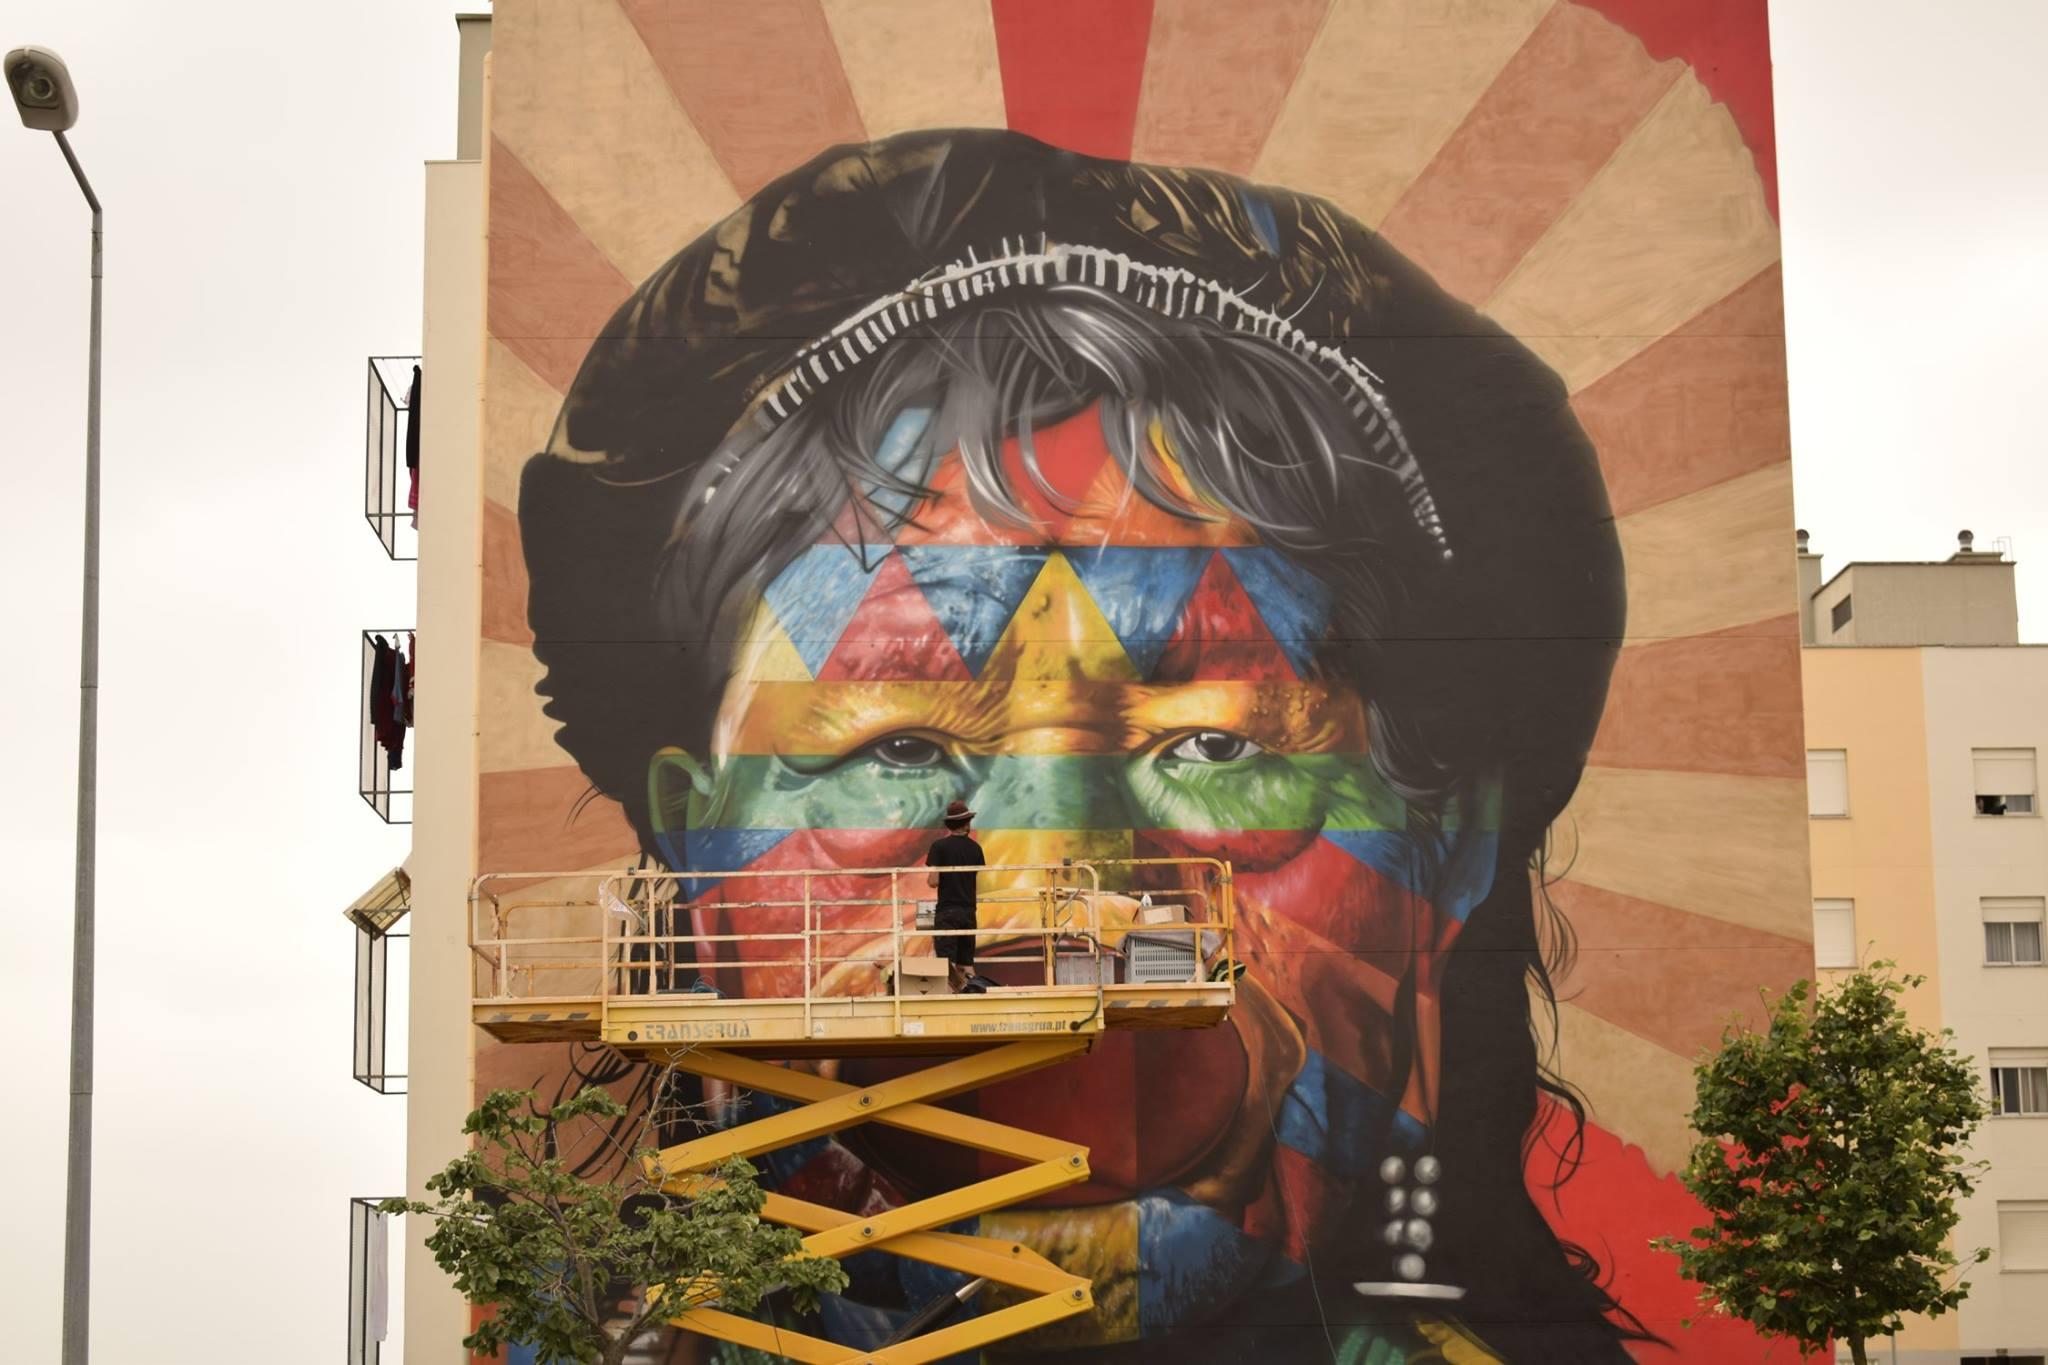 muro festival arte urbana marvila lisboa 2017 kobra